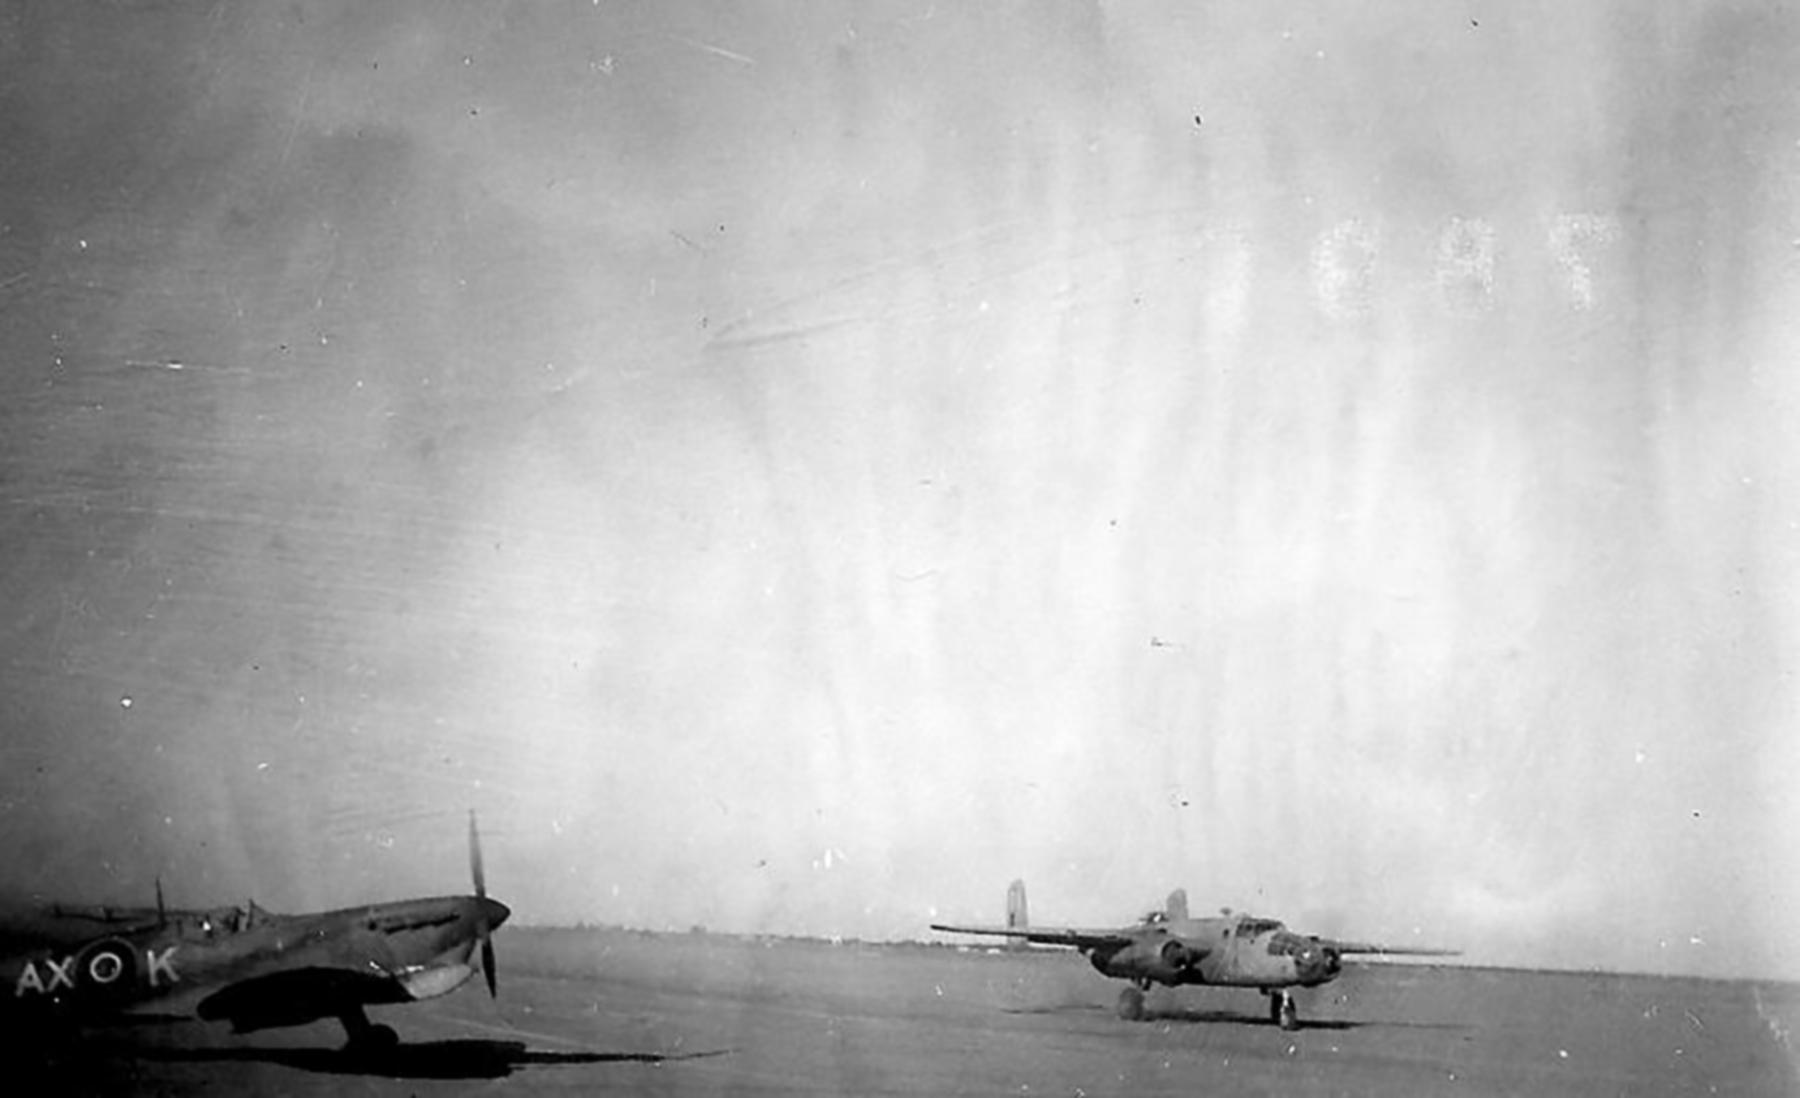 Spitfire MkVcTrop SAAF 1Sqn AXK Tunisia 1943 01